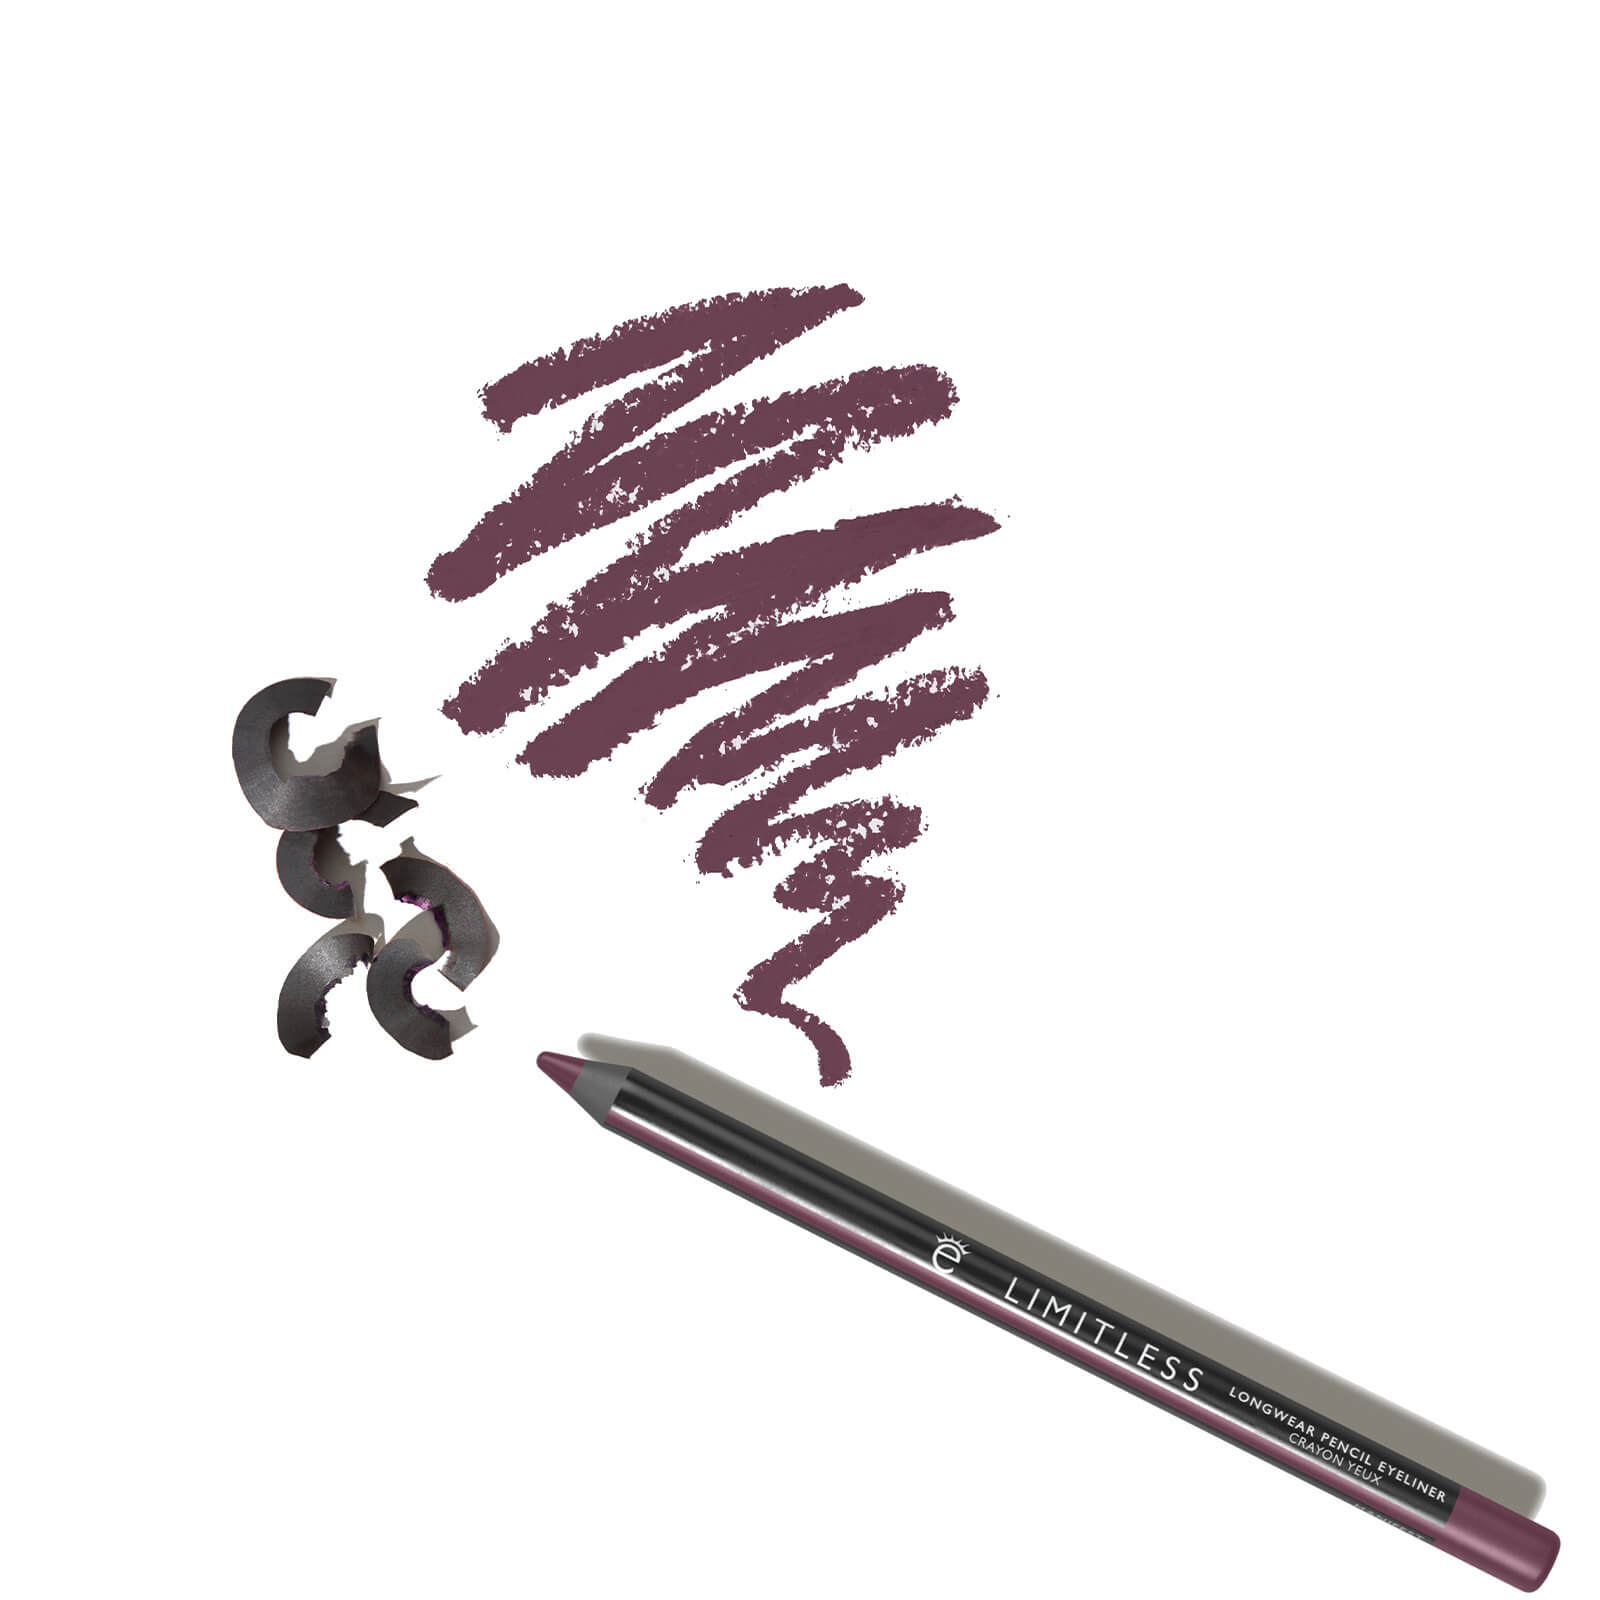 Cosmetics Limitless Long-Wear Pencil Eyeliner - Manifest